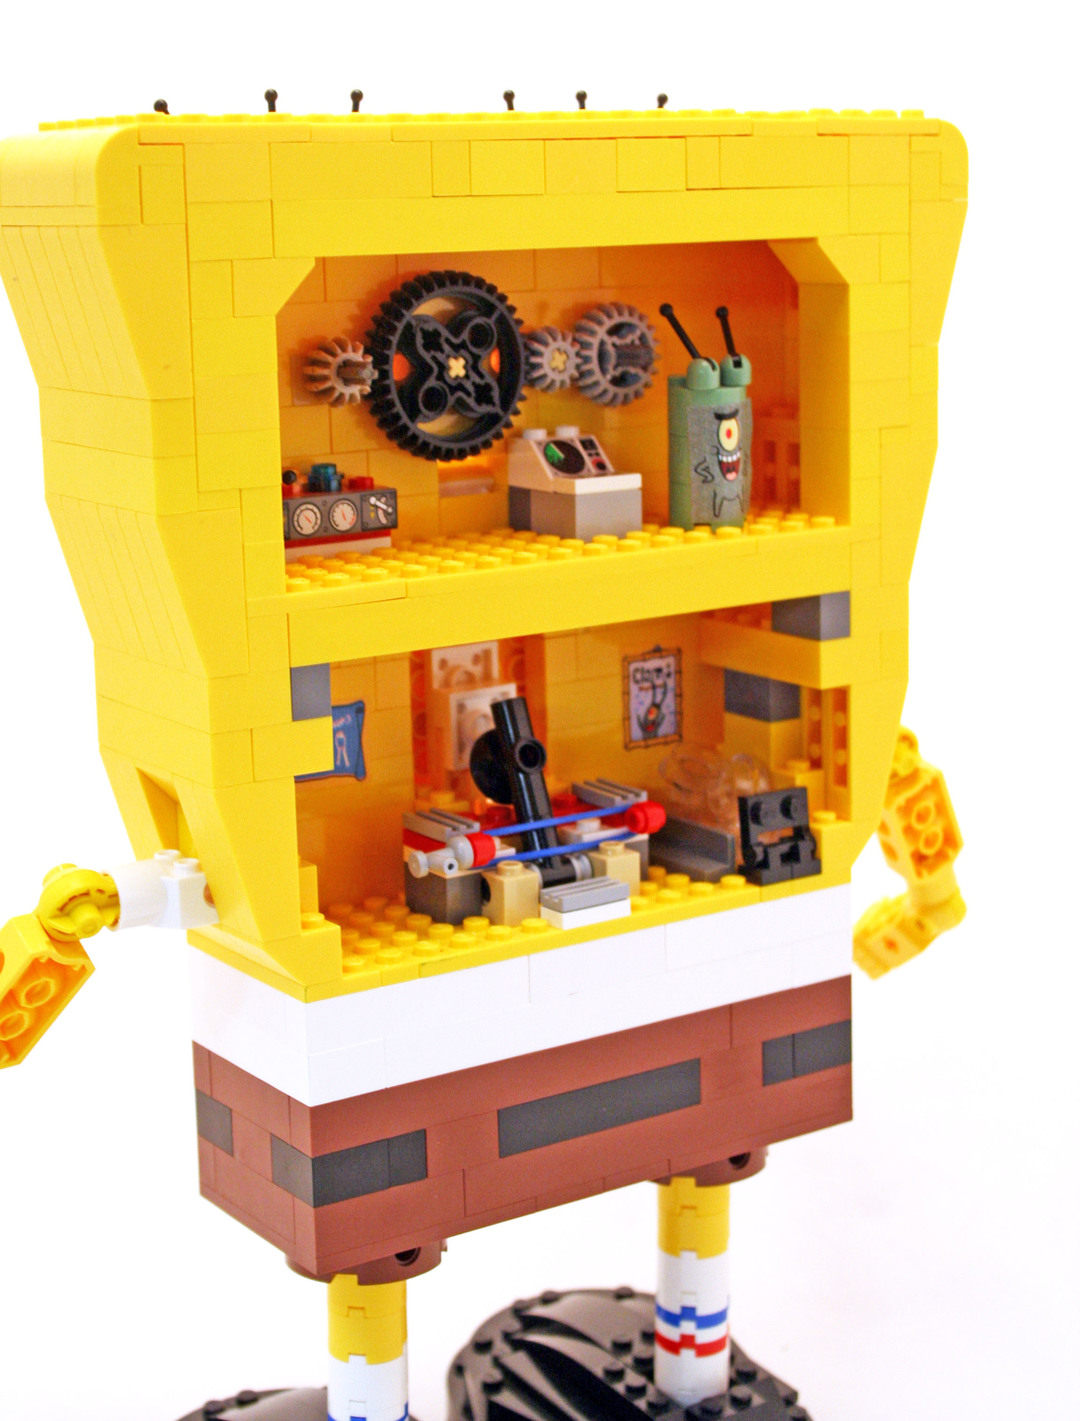 build a bob lego set 3826 1 building sets sponge bob. Black Bedroom Furniture Sets. Home Design Ideas